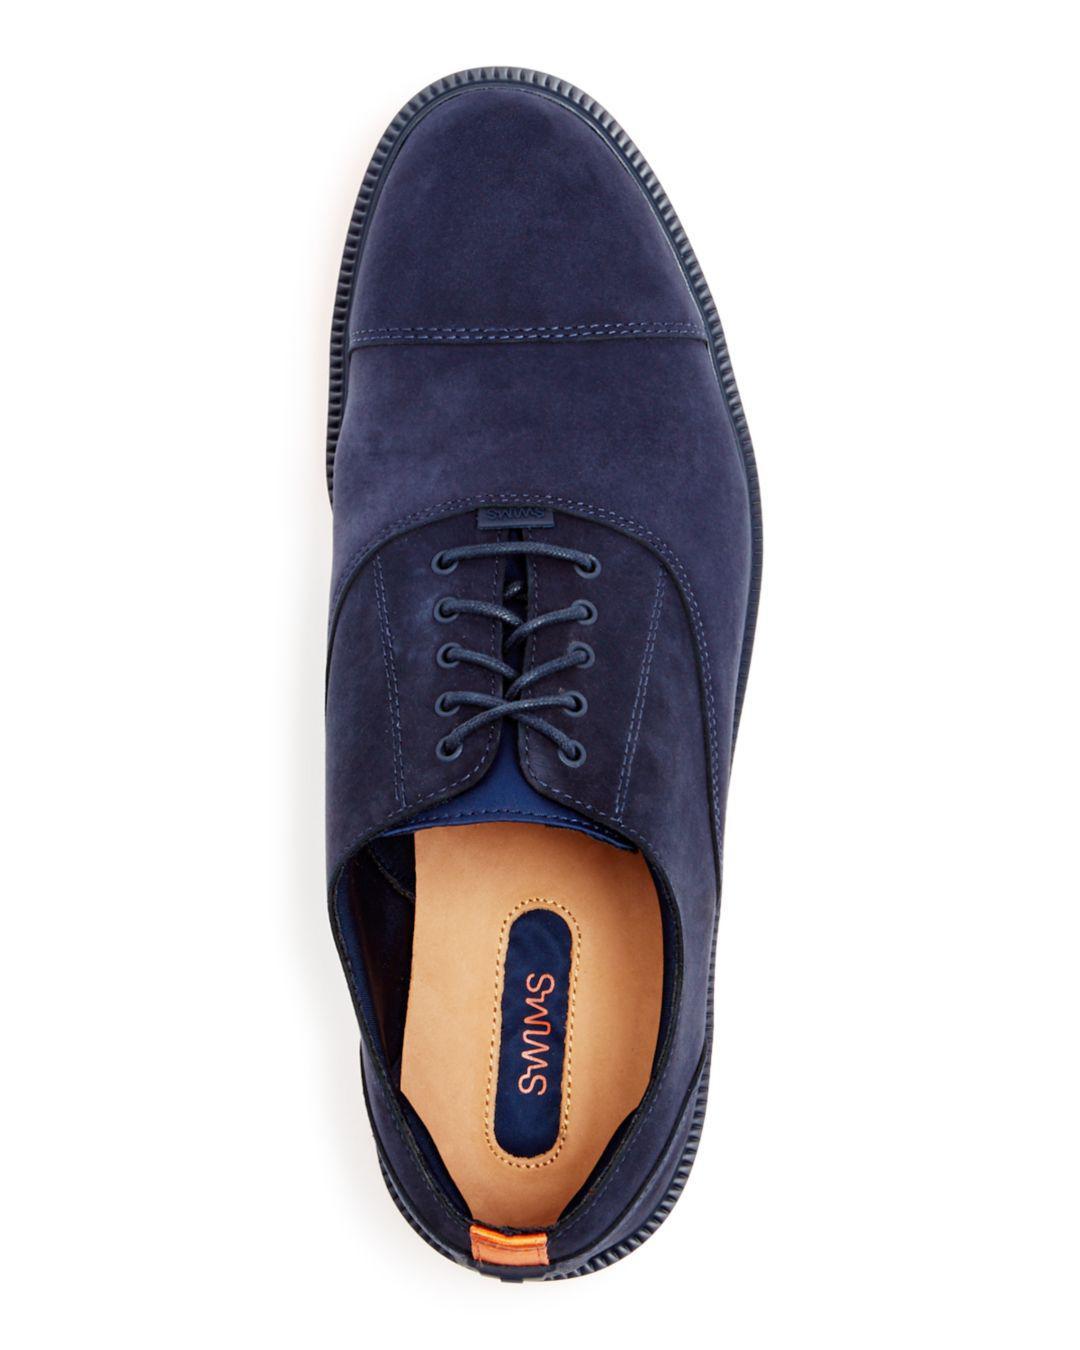 43c1b31b720f Swims Men s Motion Nubuck Leather Cap Toe Oxfords in Blue for Men - Lyst